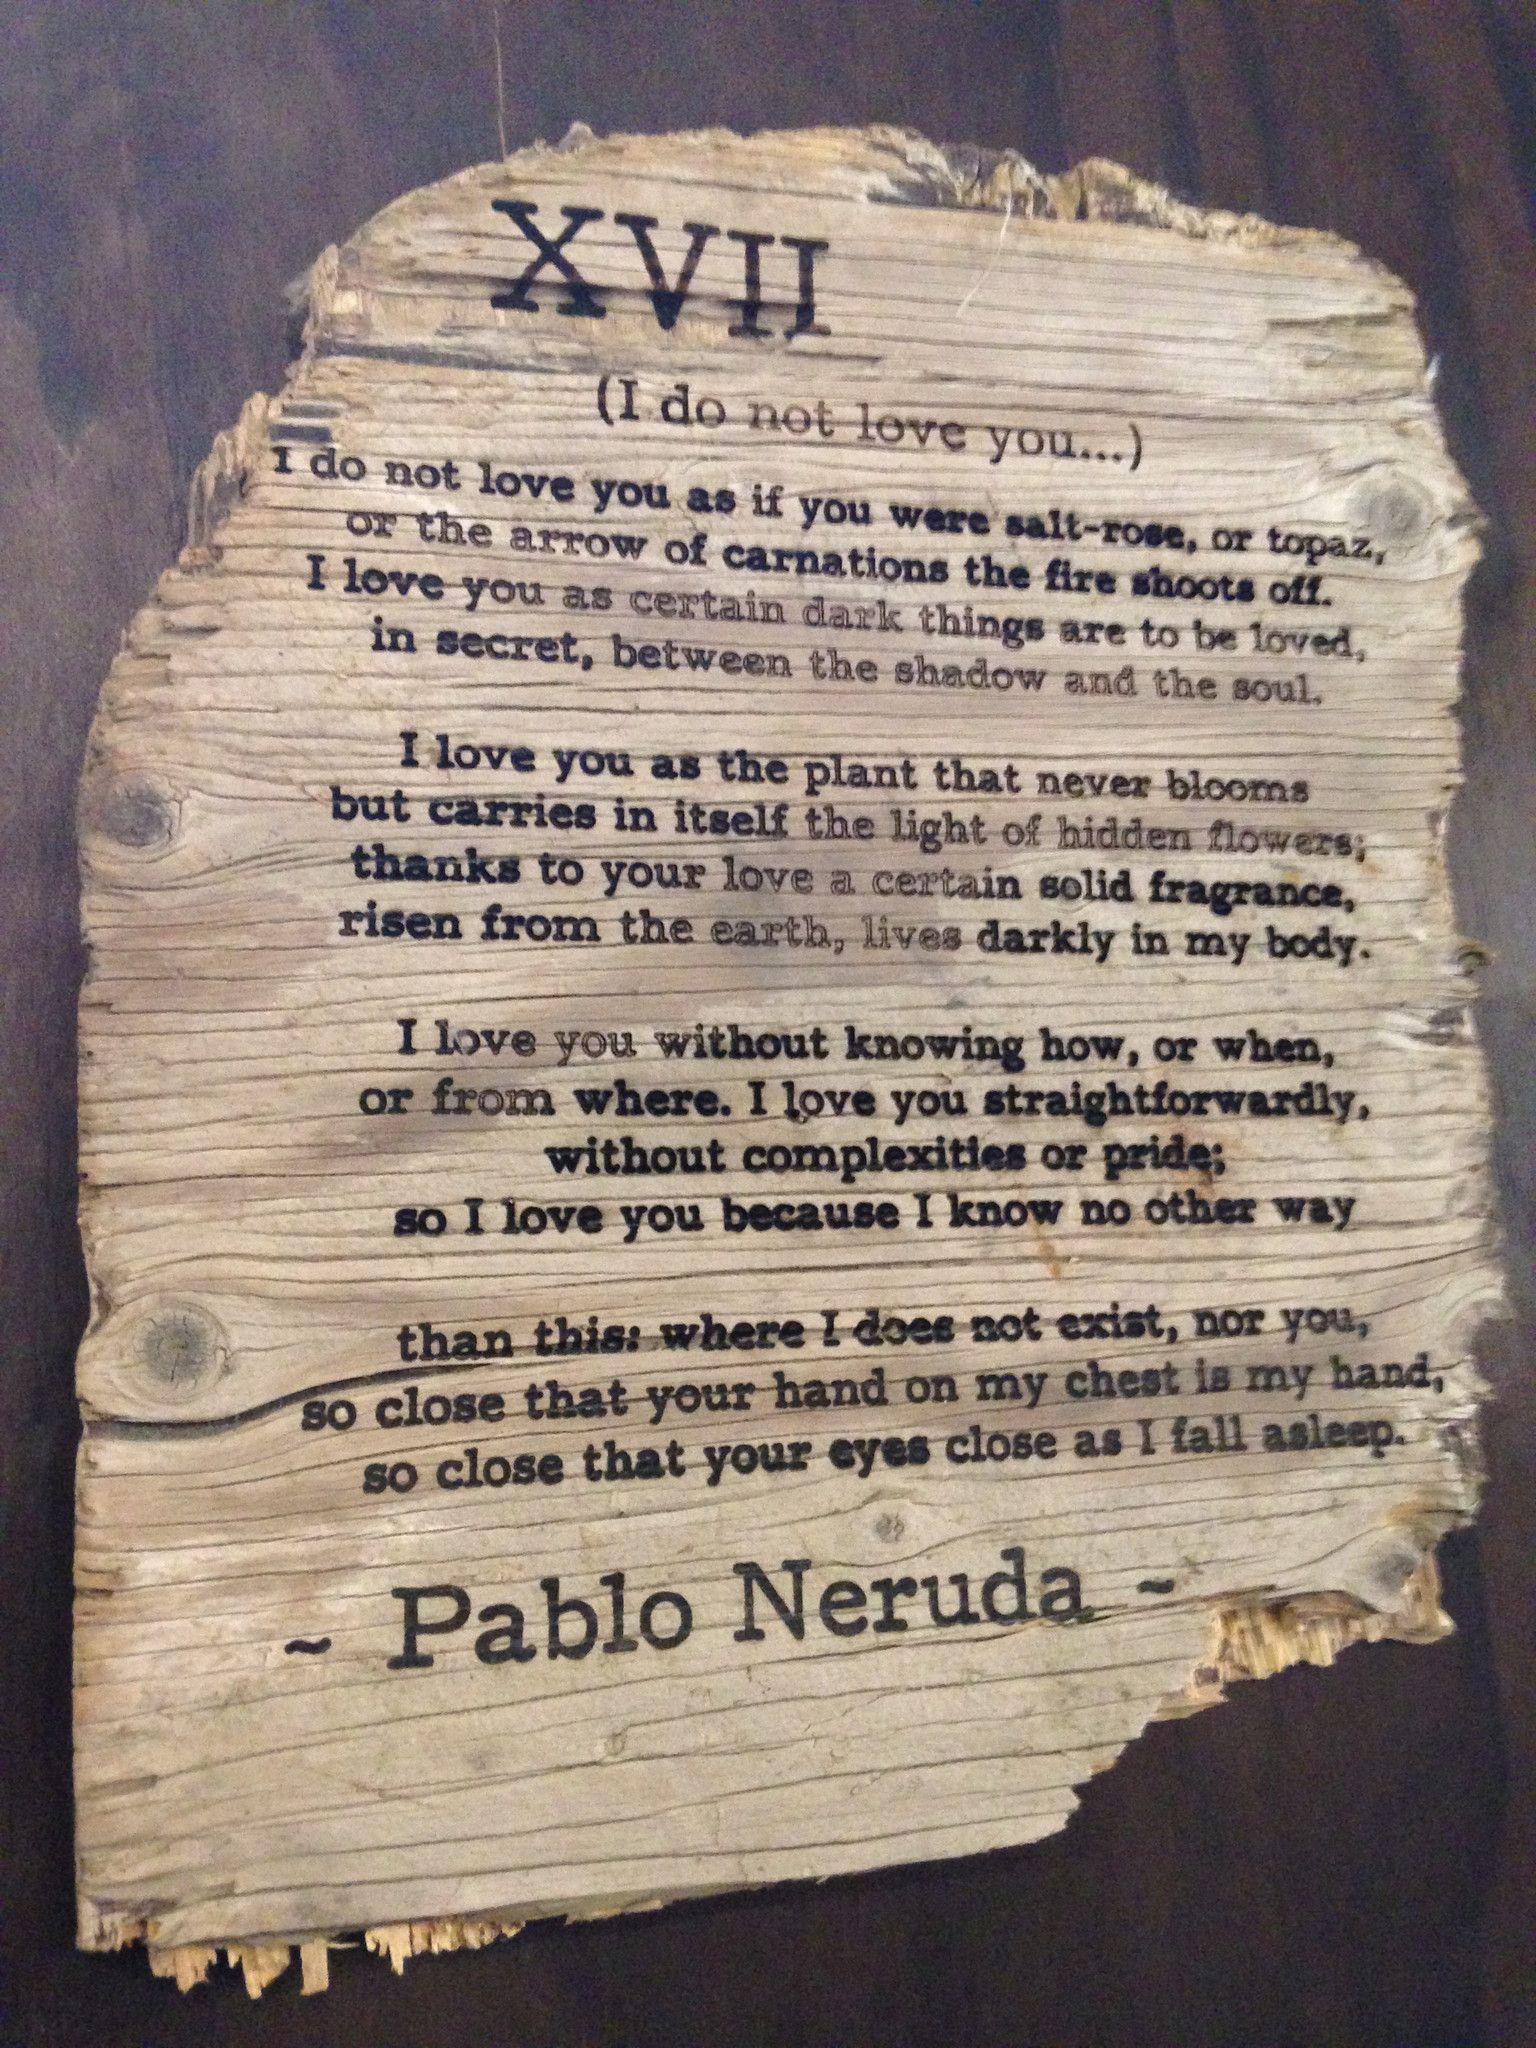 Pablo Neruda - I do not love you   Pablo neruda, Soulmate